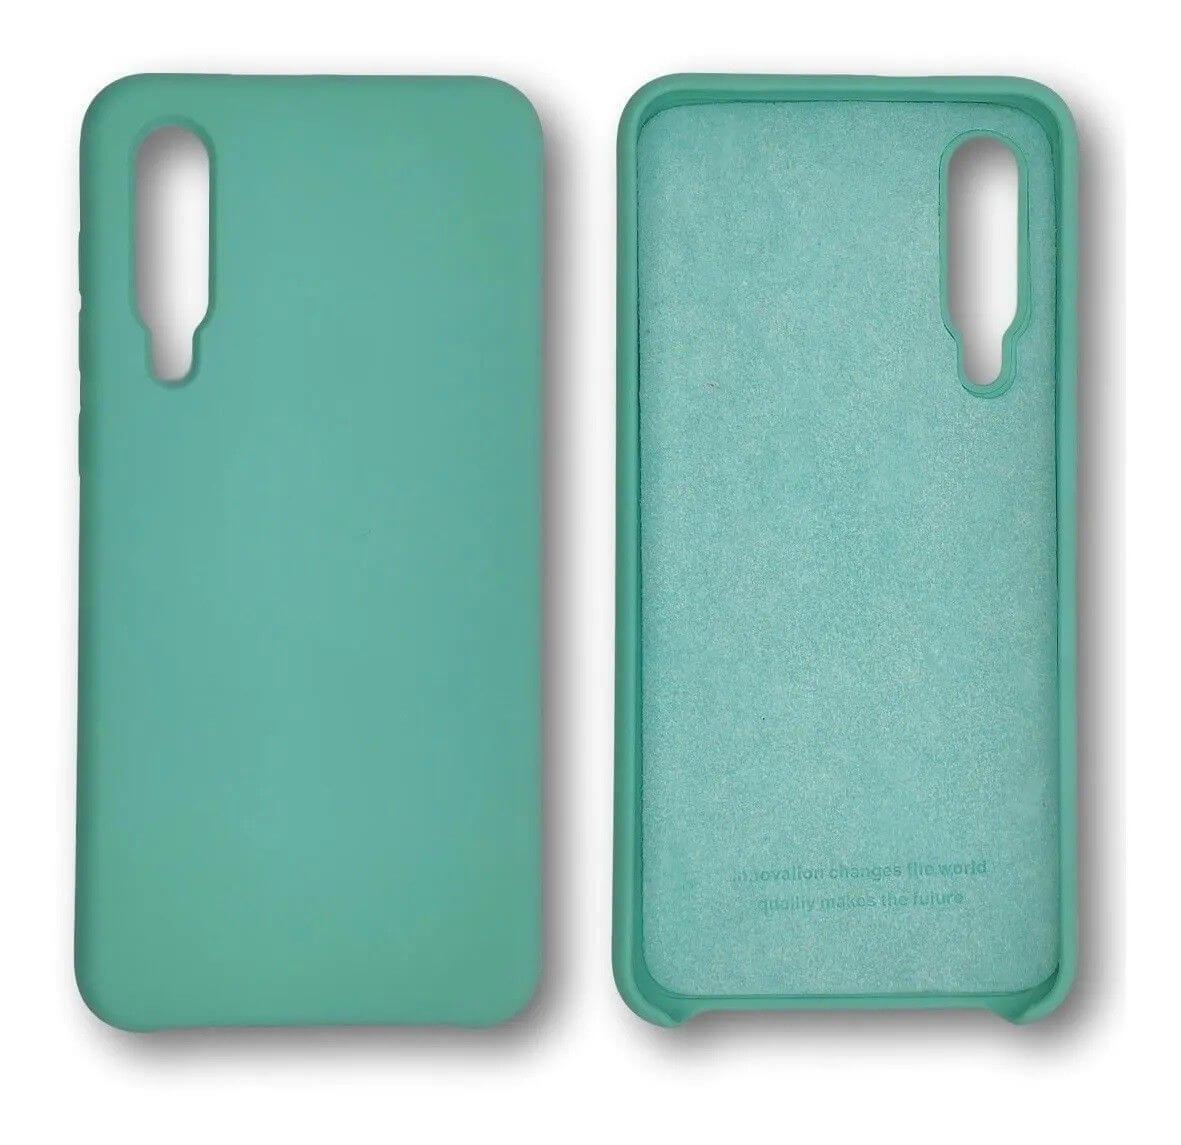 Capa Original Silicone Case Xiaomi MI 9 SE Verde Claro SC-MI9SE-VC